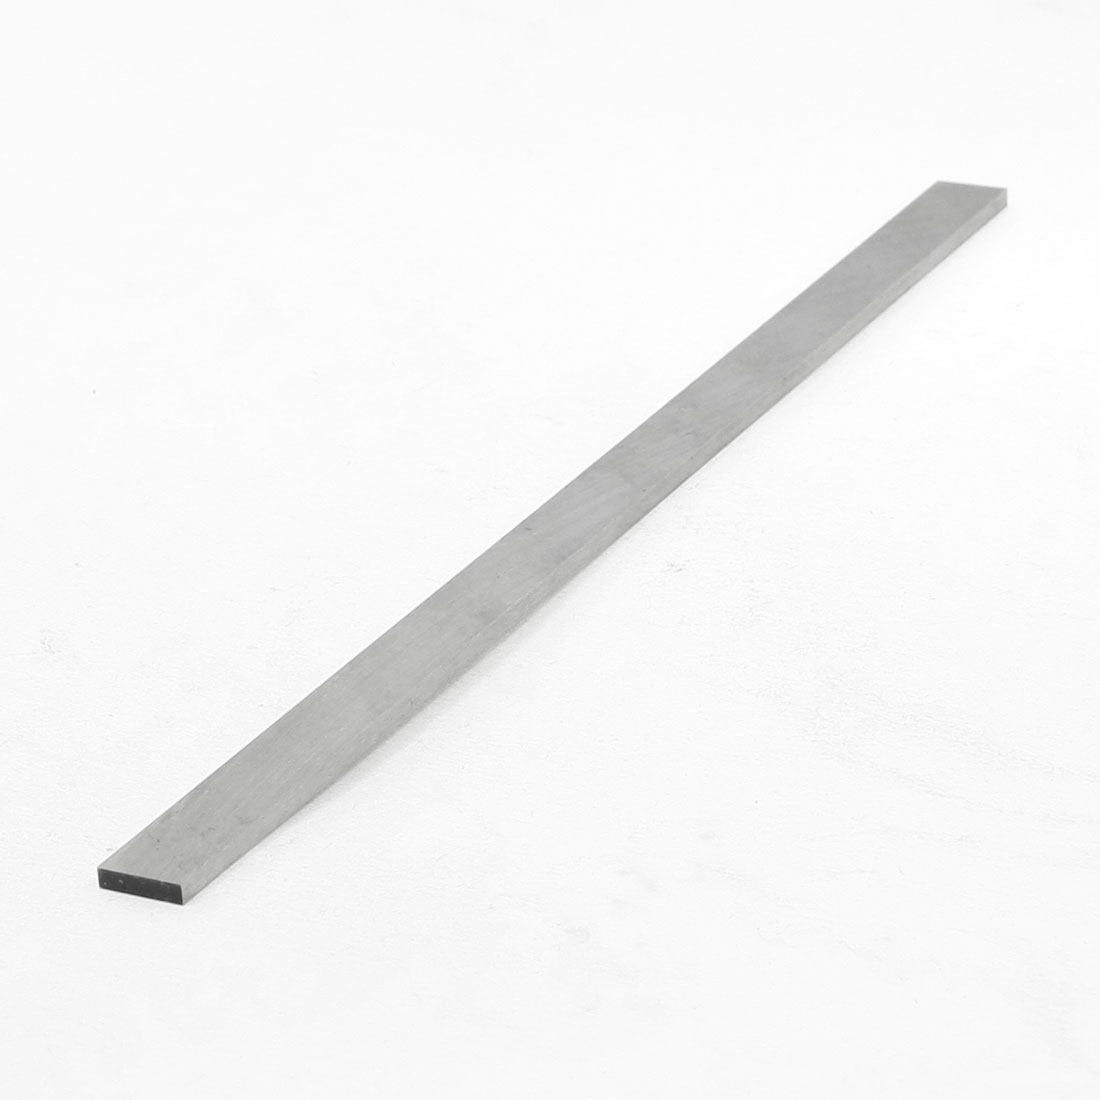 Metalworker Milling Engraving Lathe HSS Tool Bit 3mmx10mmx200mm